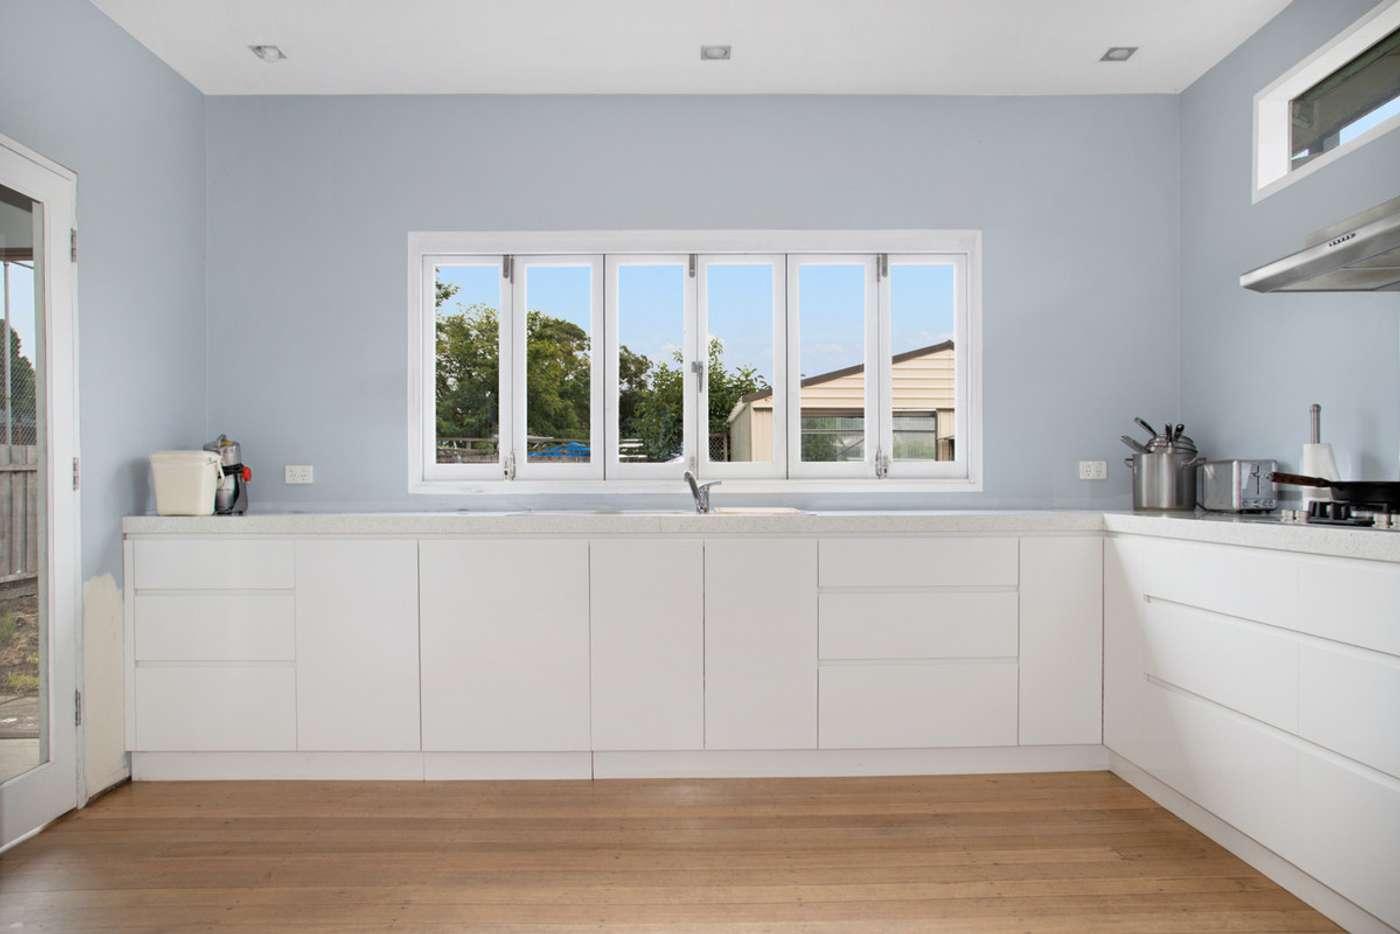 Sixth view of Homely house listing, 134 Albert Road, Moonah TAS 7009